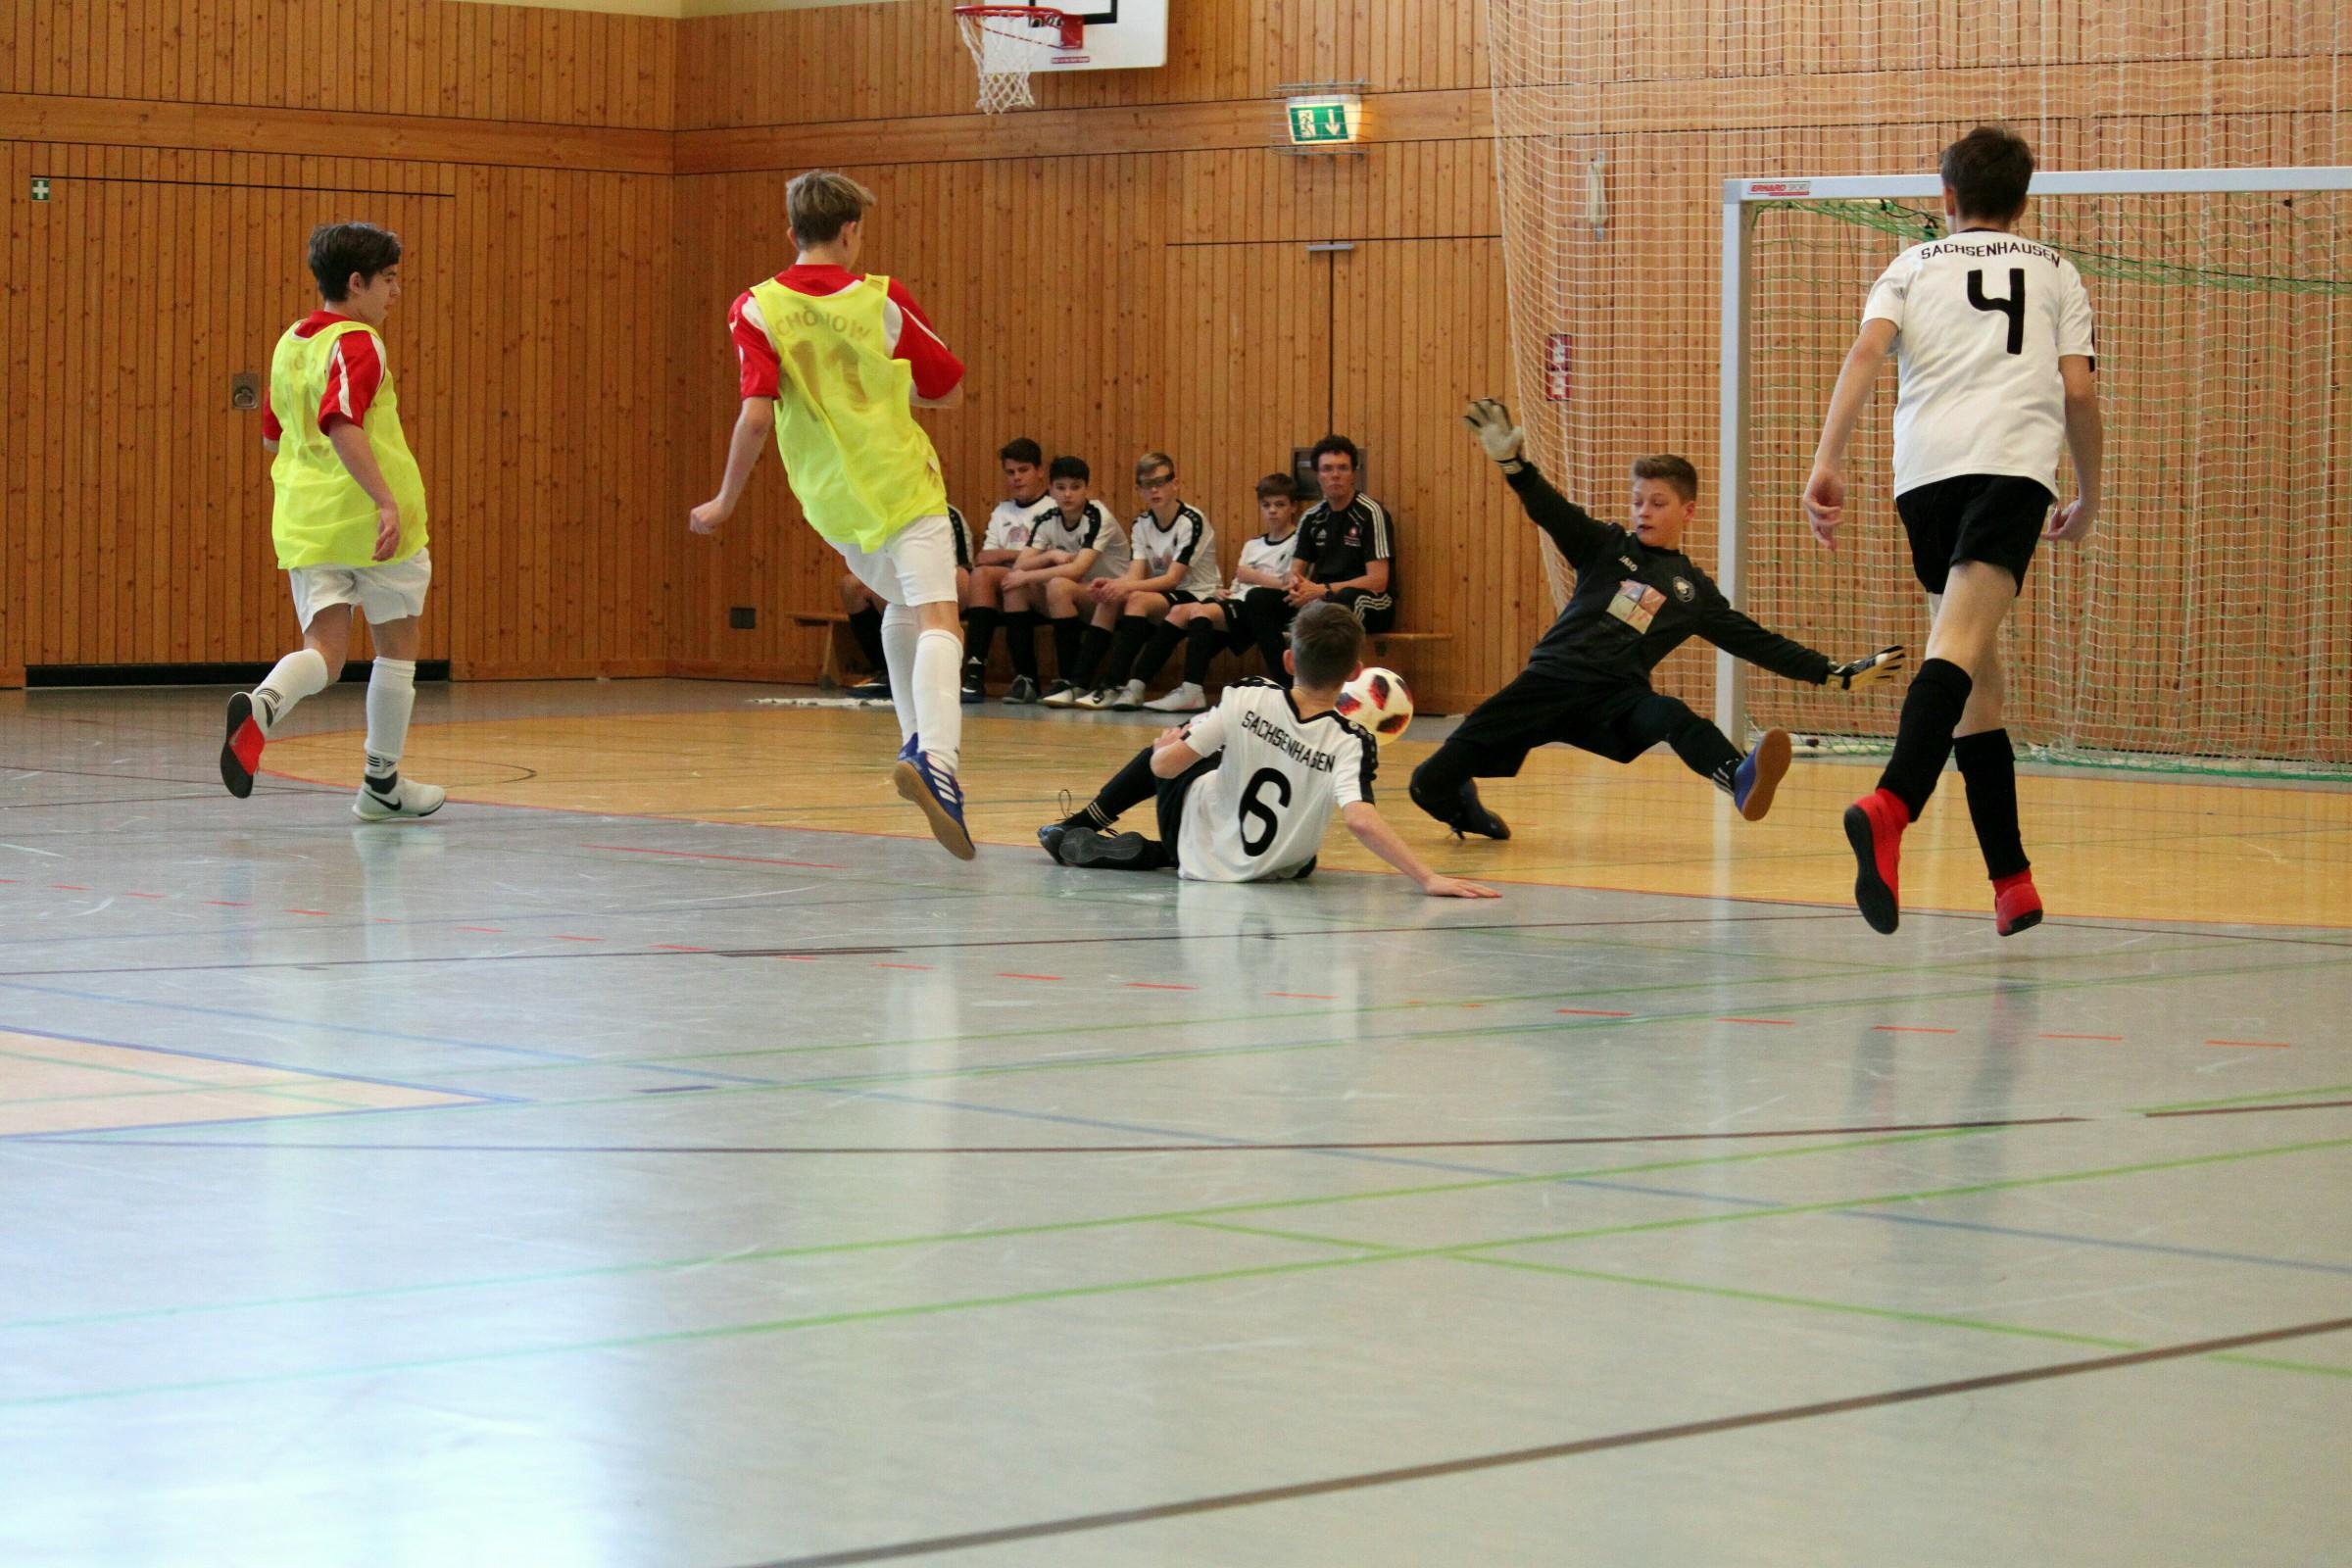 20190217 3. Wandlitzer Hallen-Cup der C-Junioren  (4)